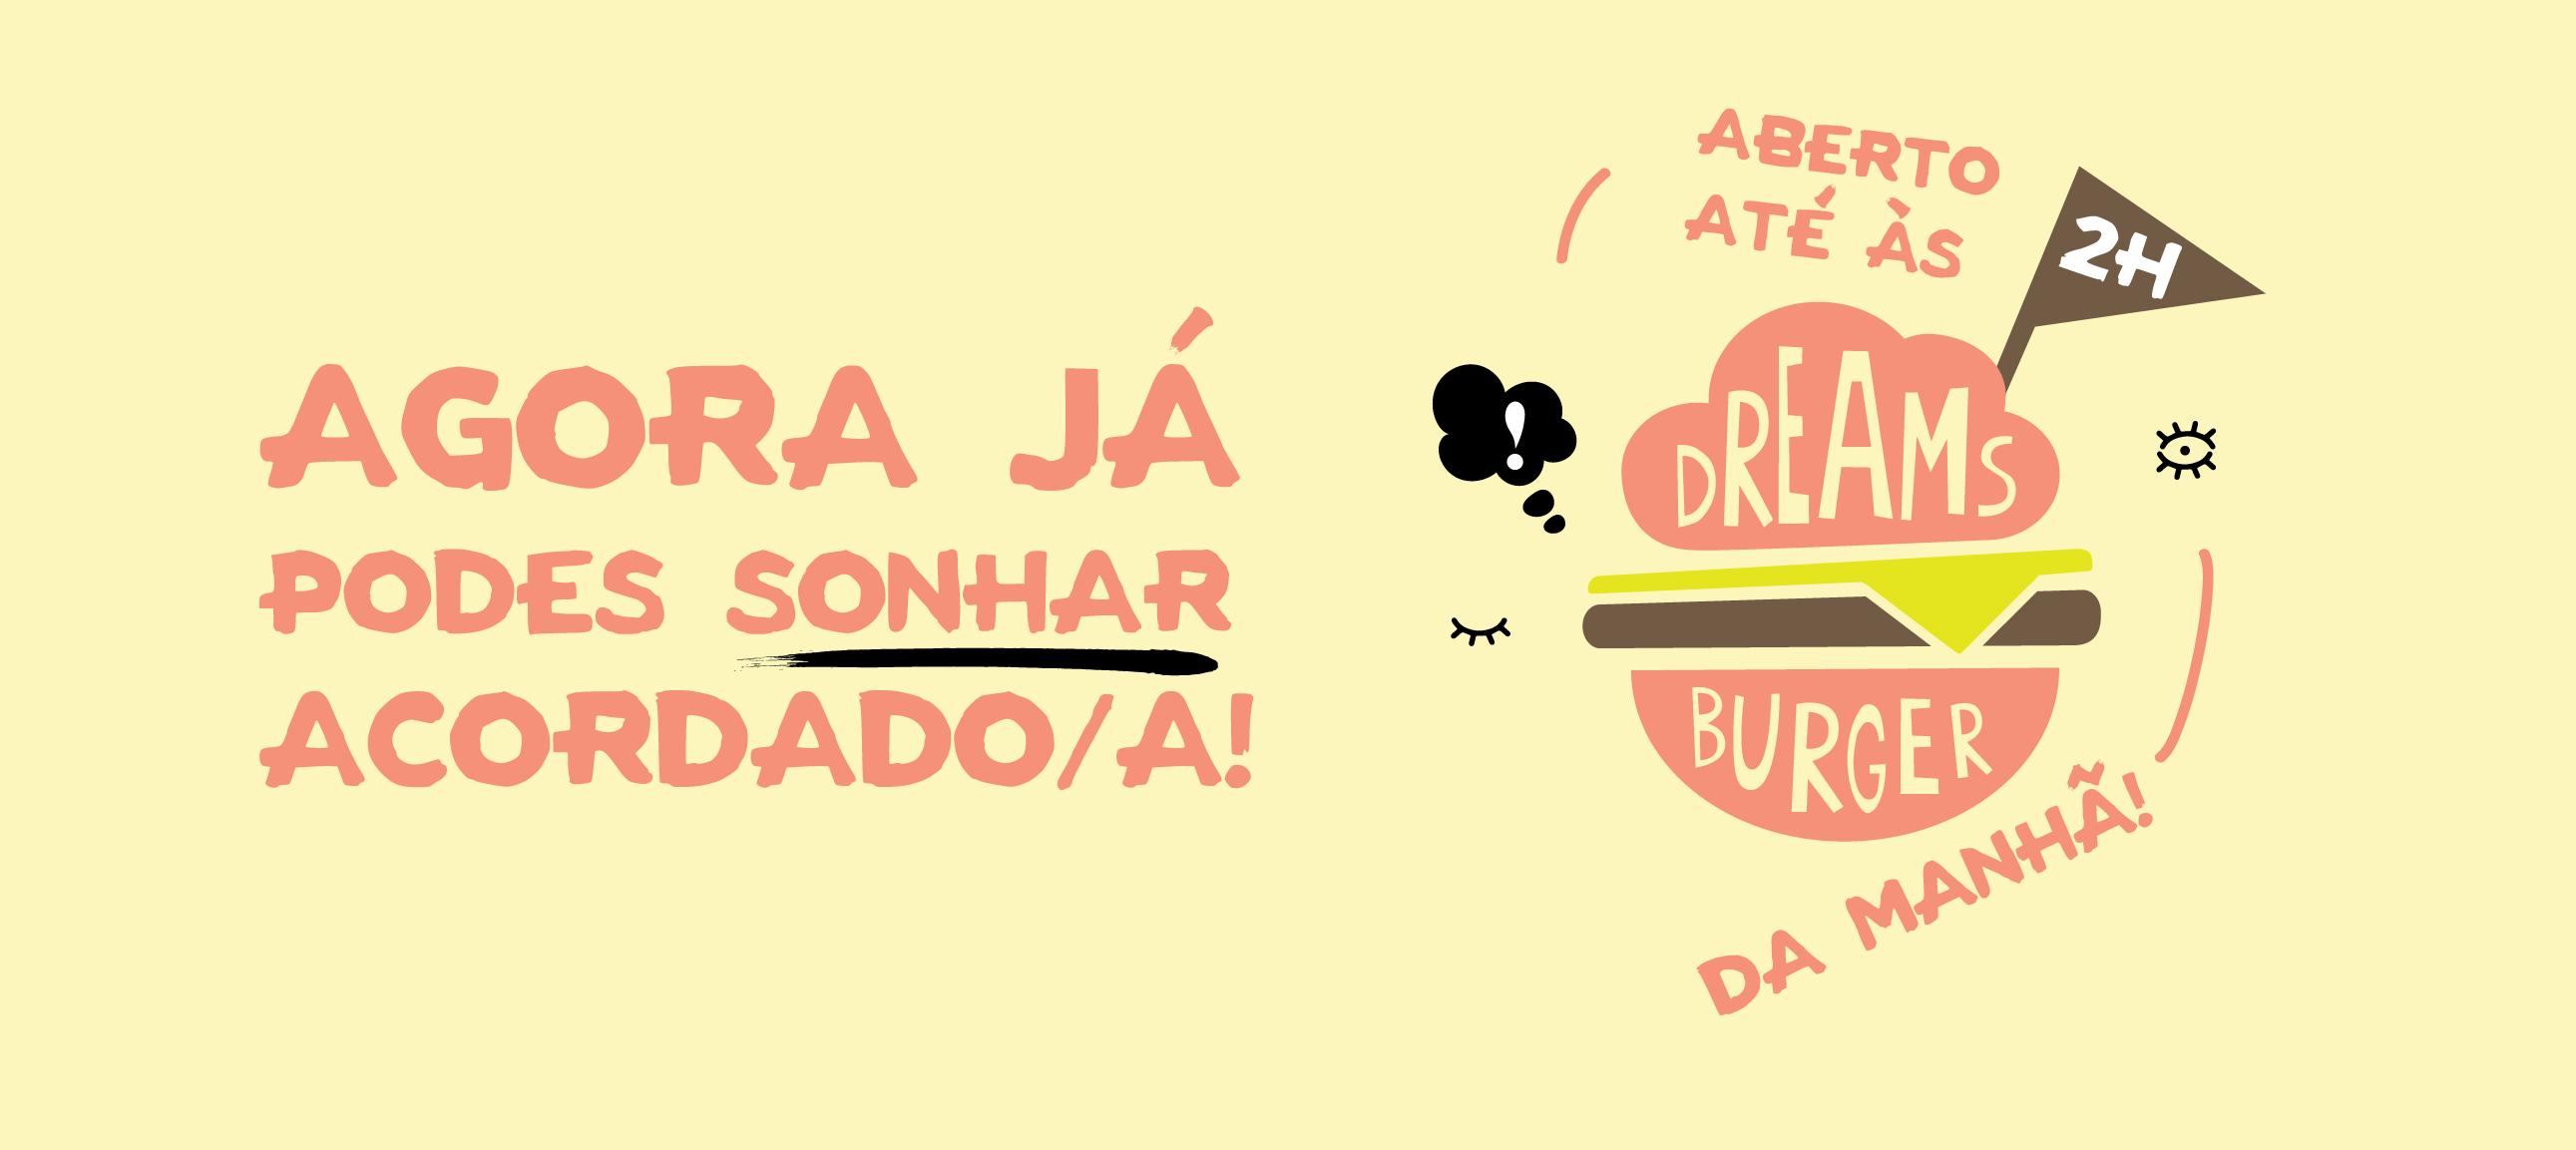 Dreams Burger - Restaurante Hamburgueria